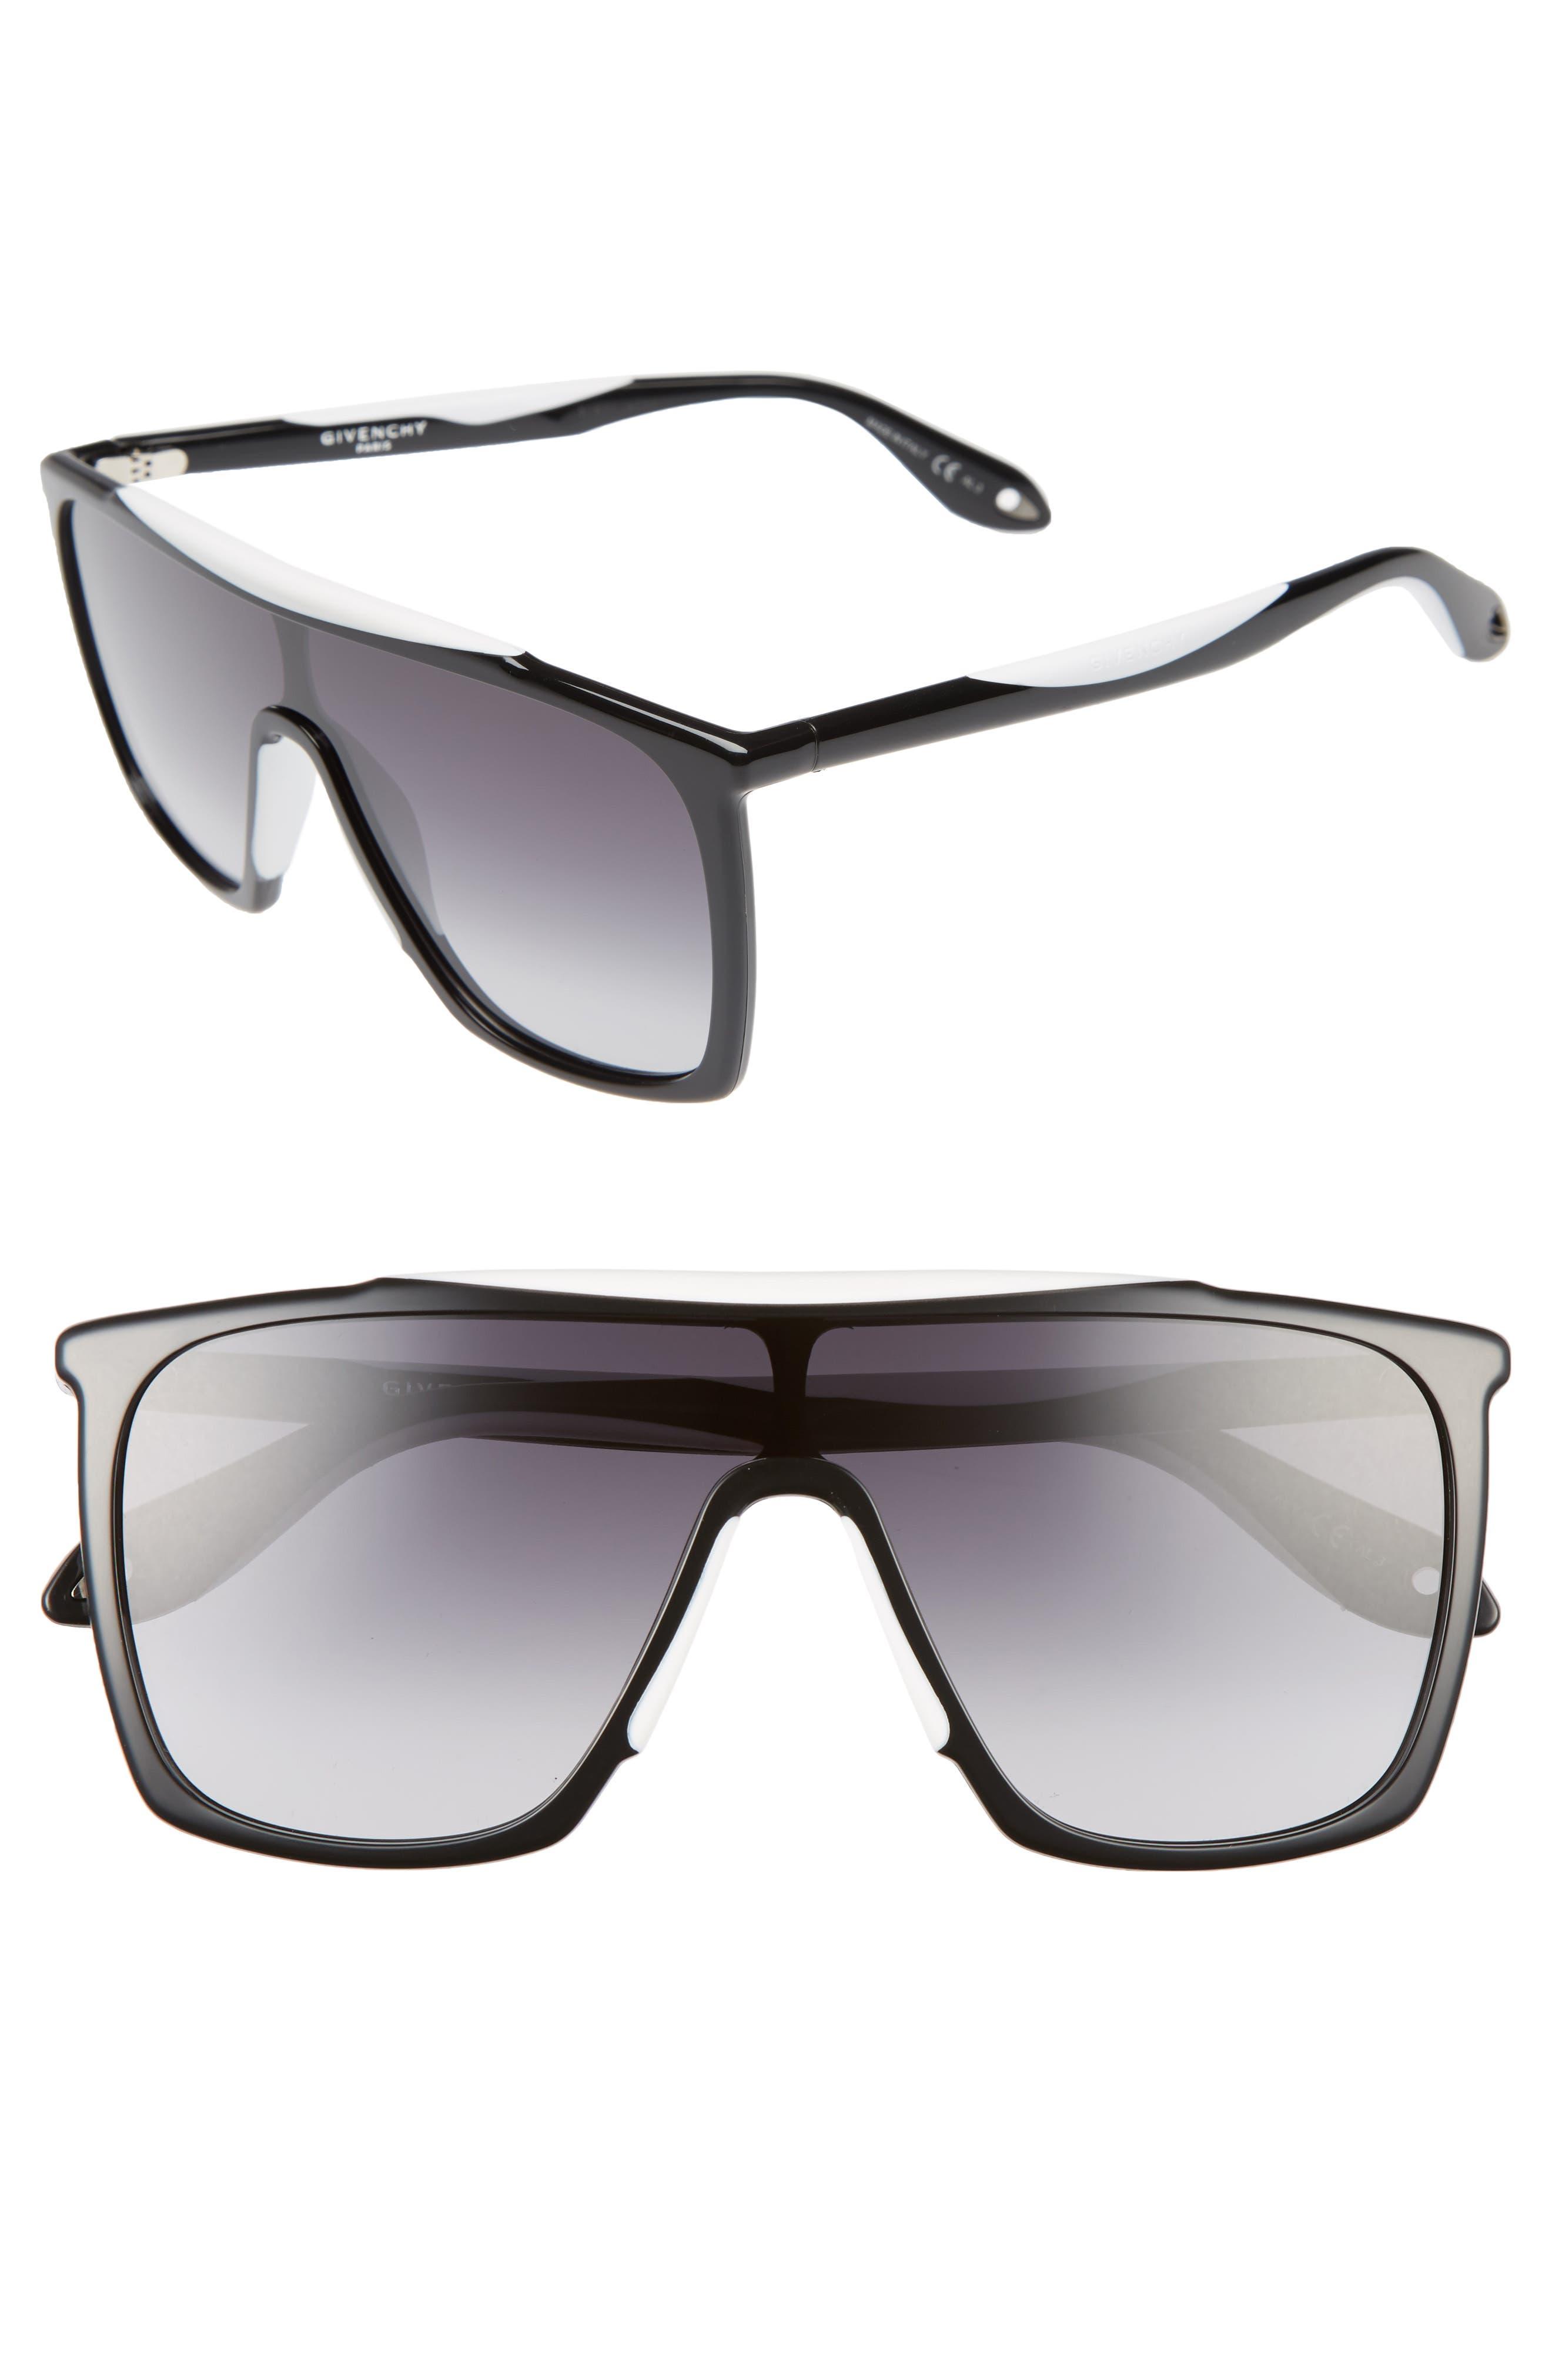 Main Image - Givenchy 53mm Mask Sunglasses